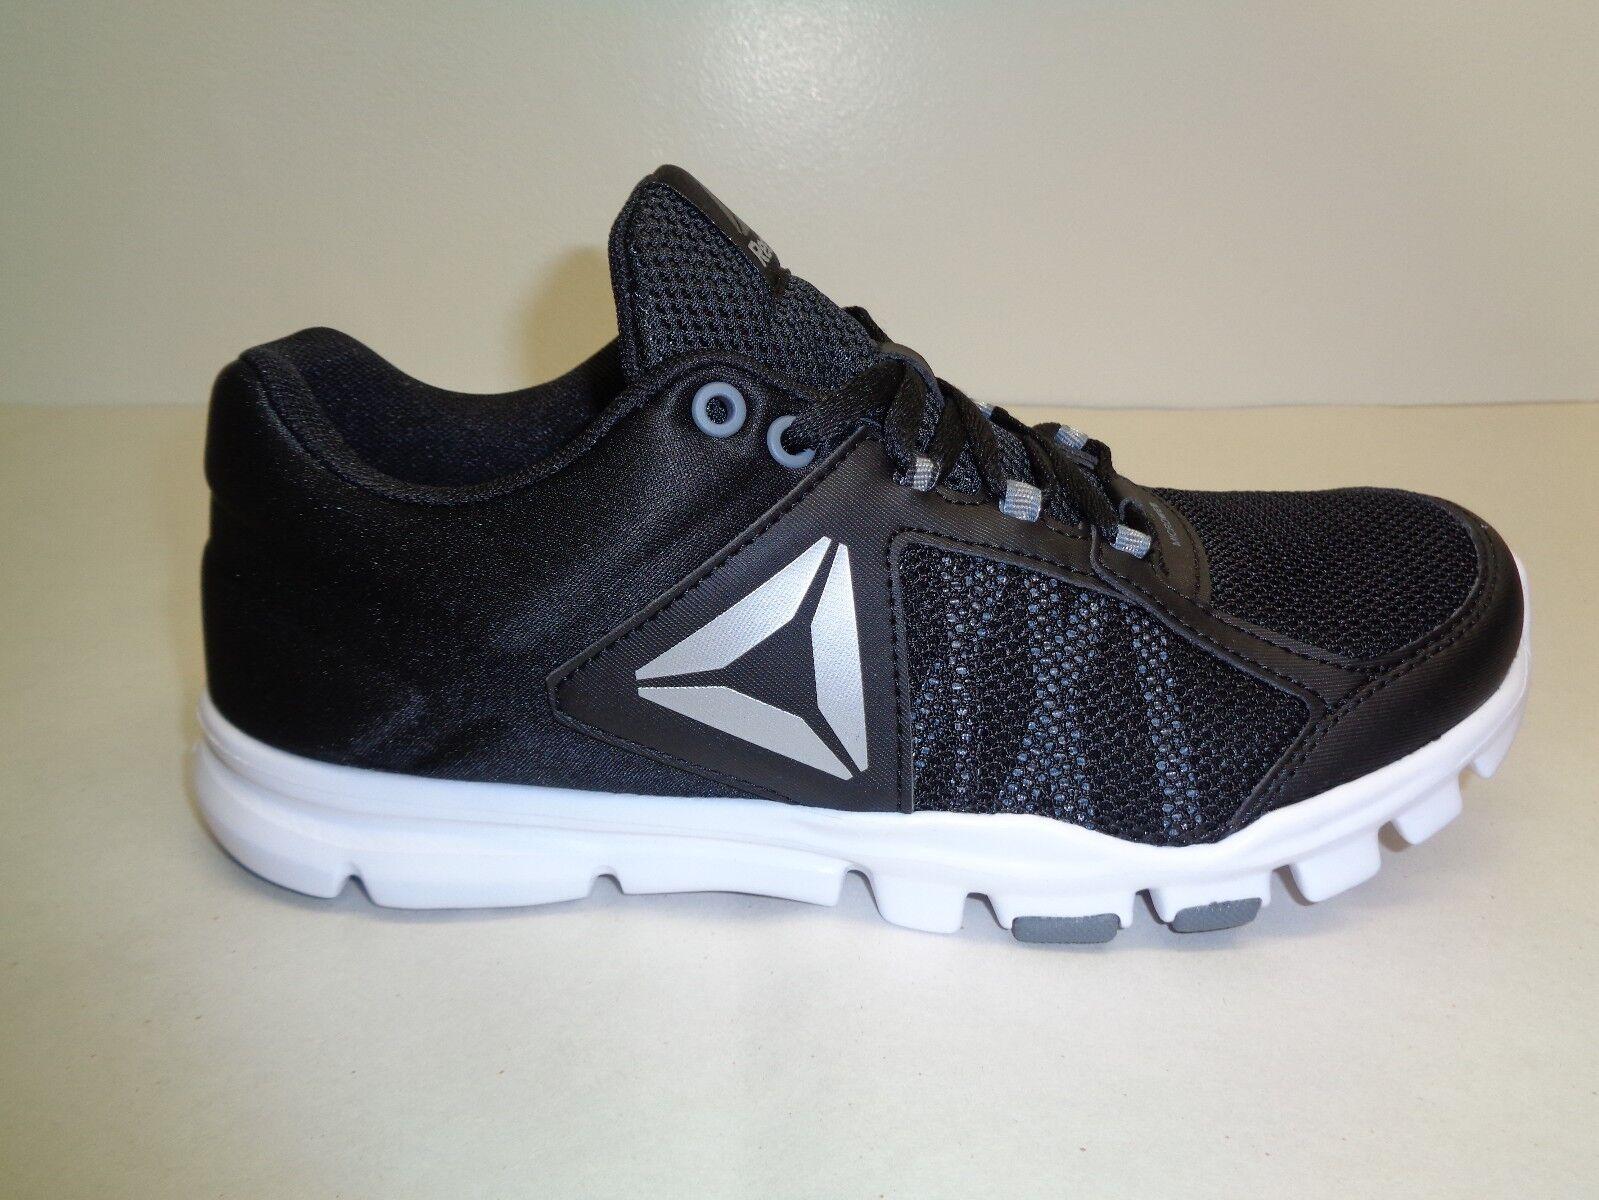 Reebok Size 8 YOURFLEX TRAINETTE 9.0 9.0 9.0 MT Black Training Sneakers New Womens shoes 6f67c4